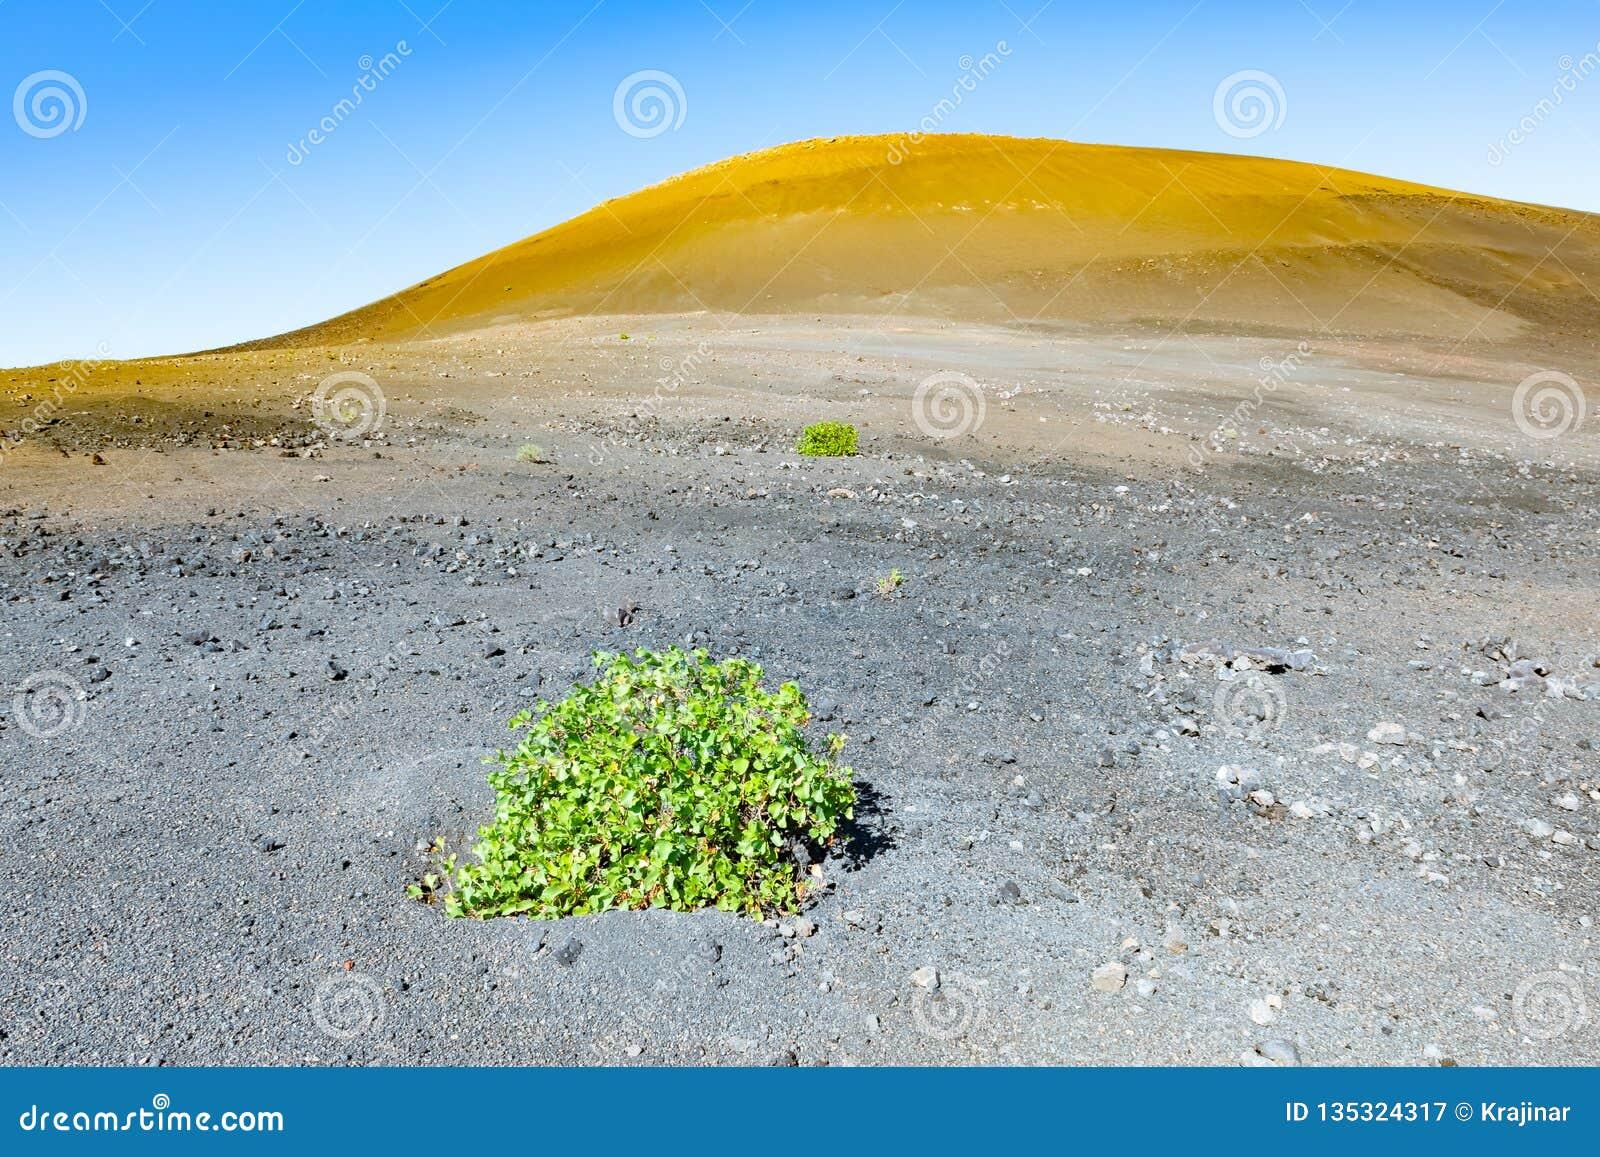 Amazing Vulcanic Landscape Of The Caldera De Los Cuervos